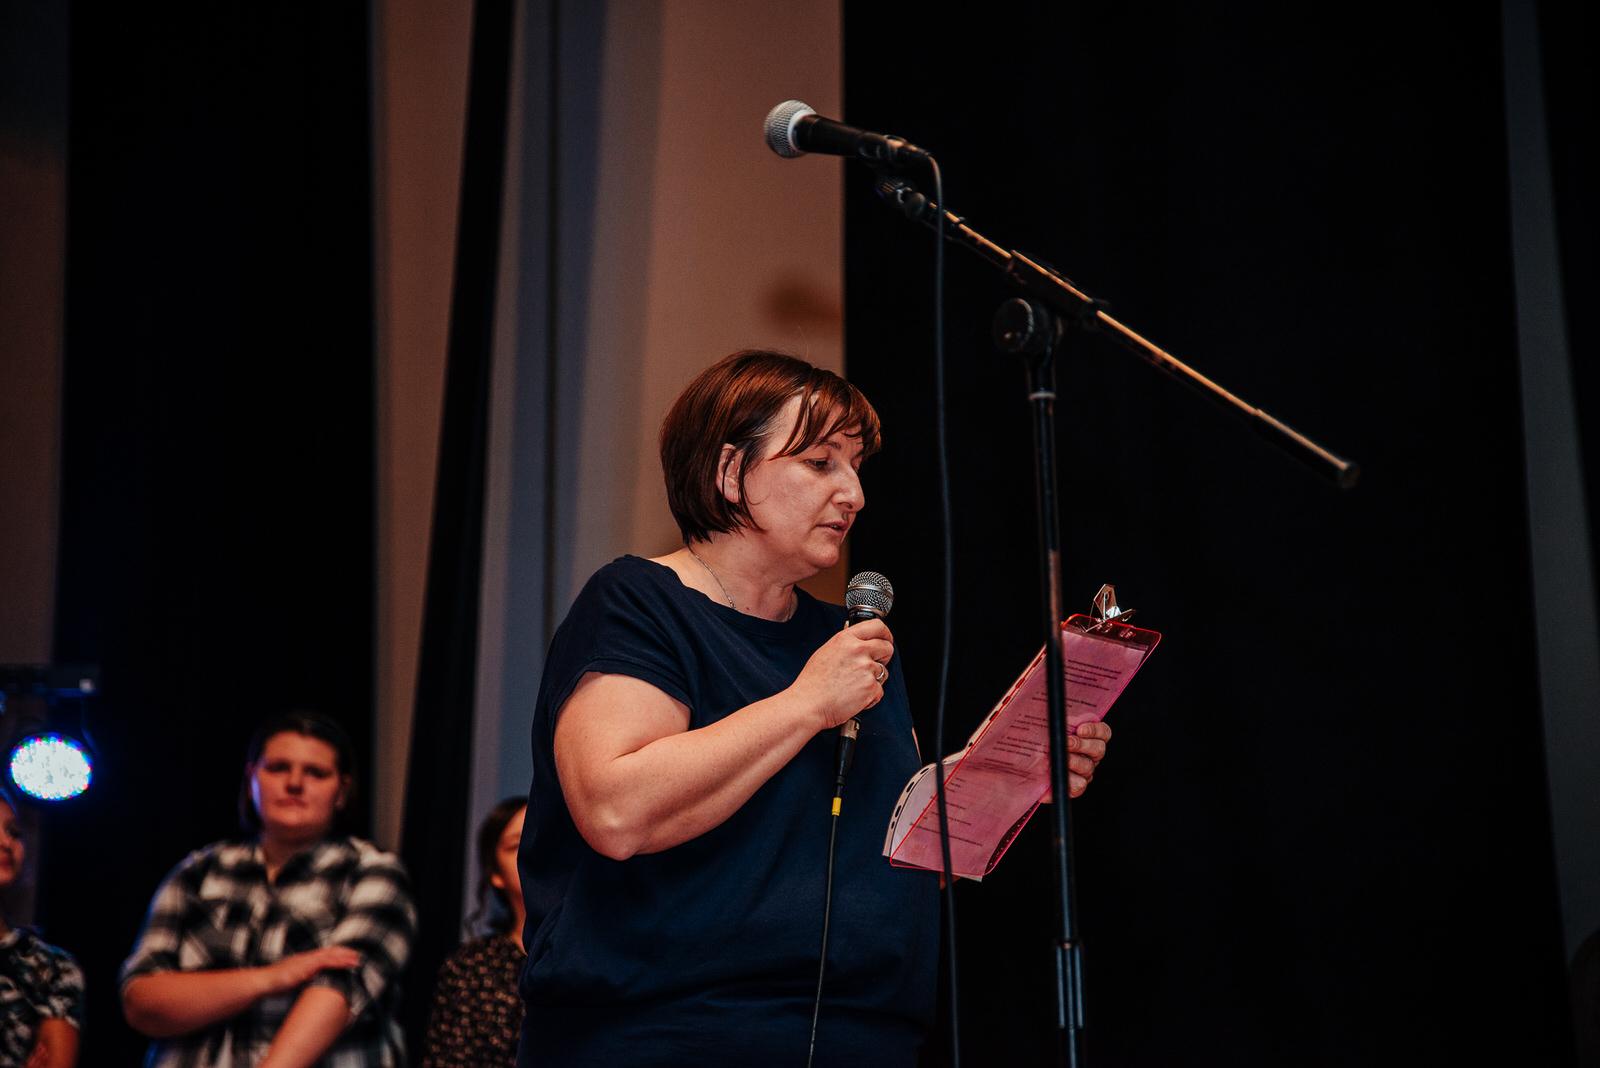 LIKACLUB_Najljepši-glas-za-Pčelice_2019-18